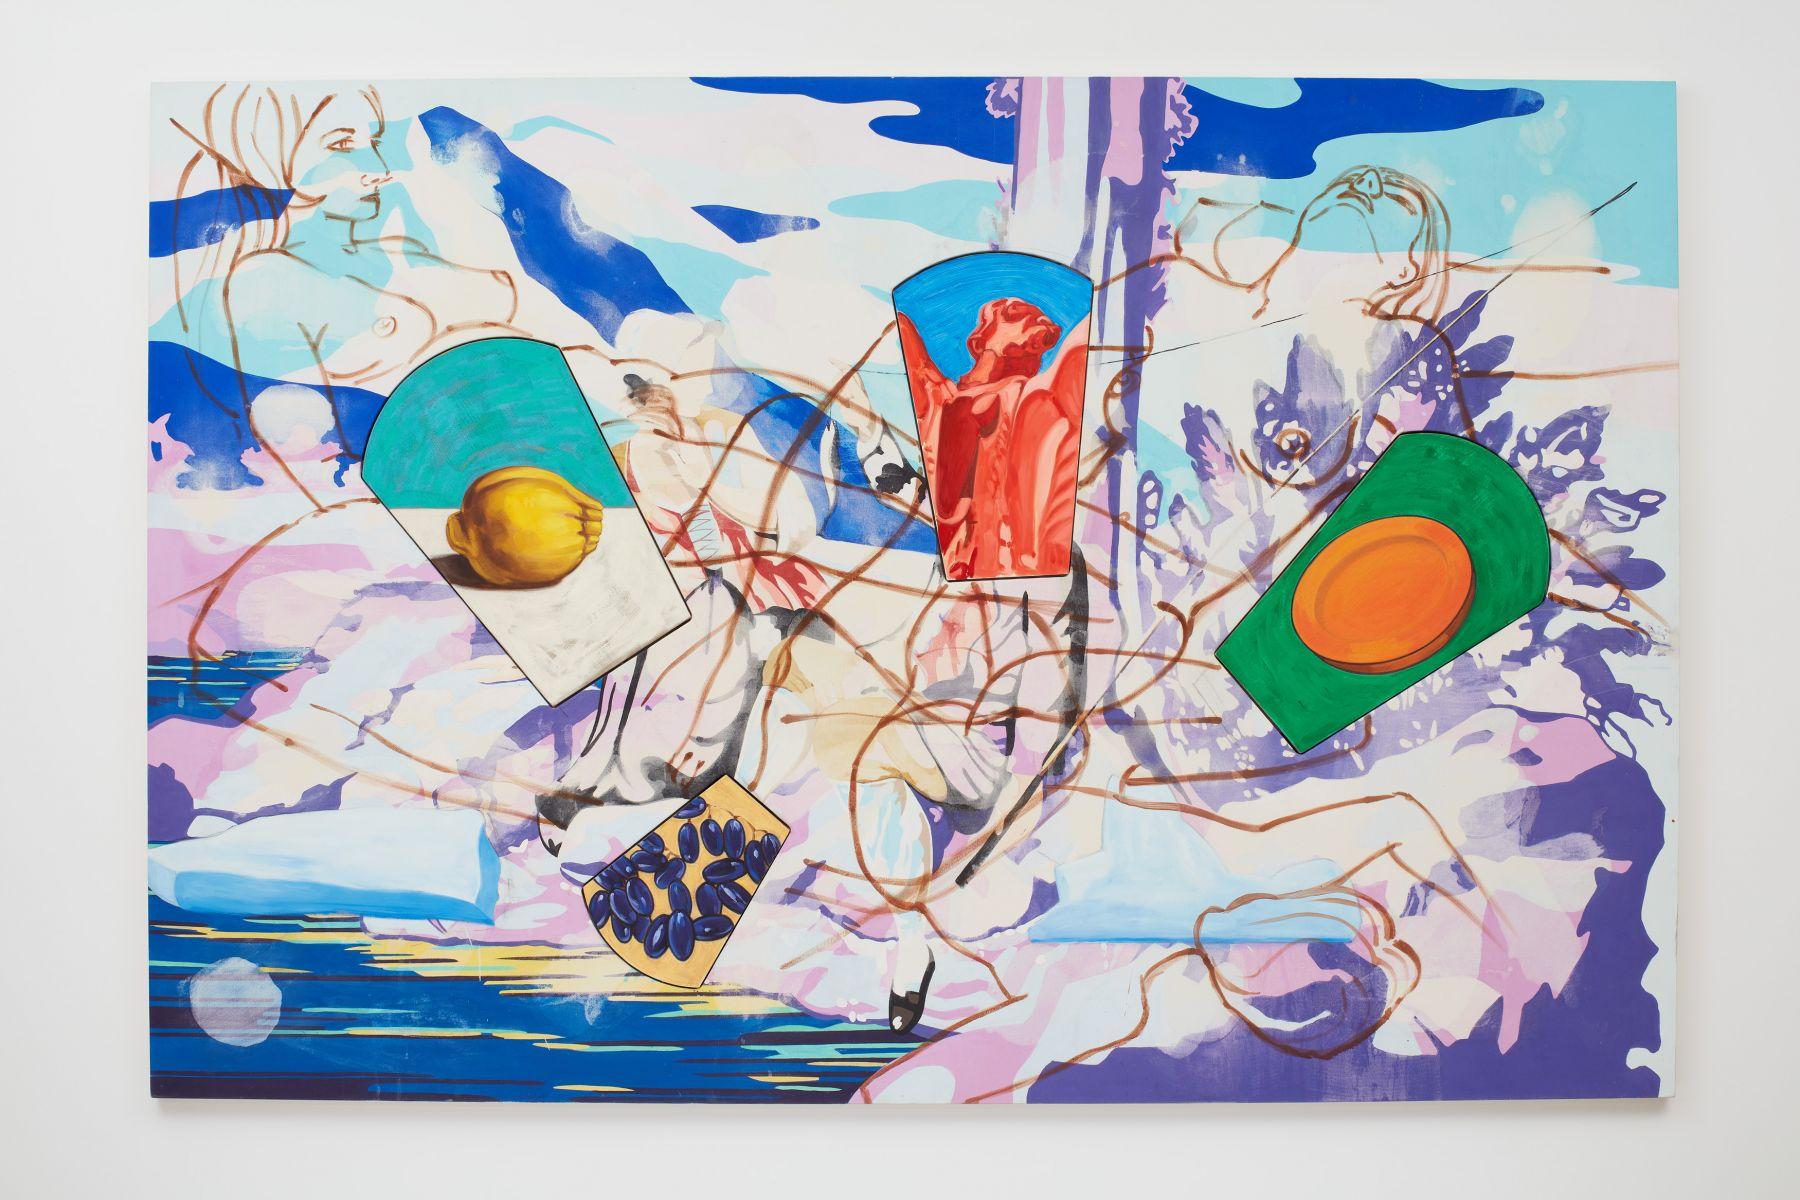 DAVID SALLE Ice Flow II, 2001